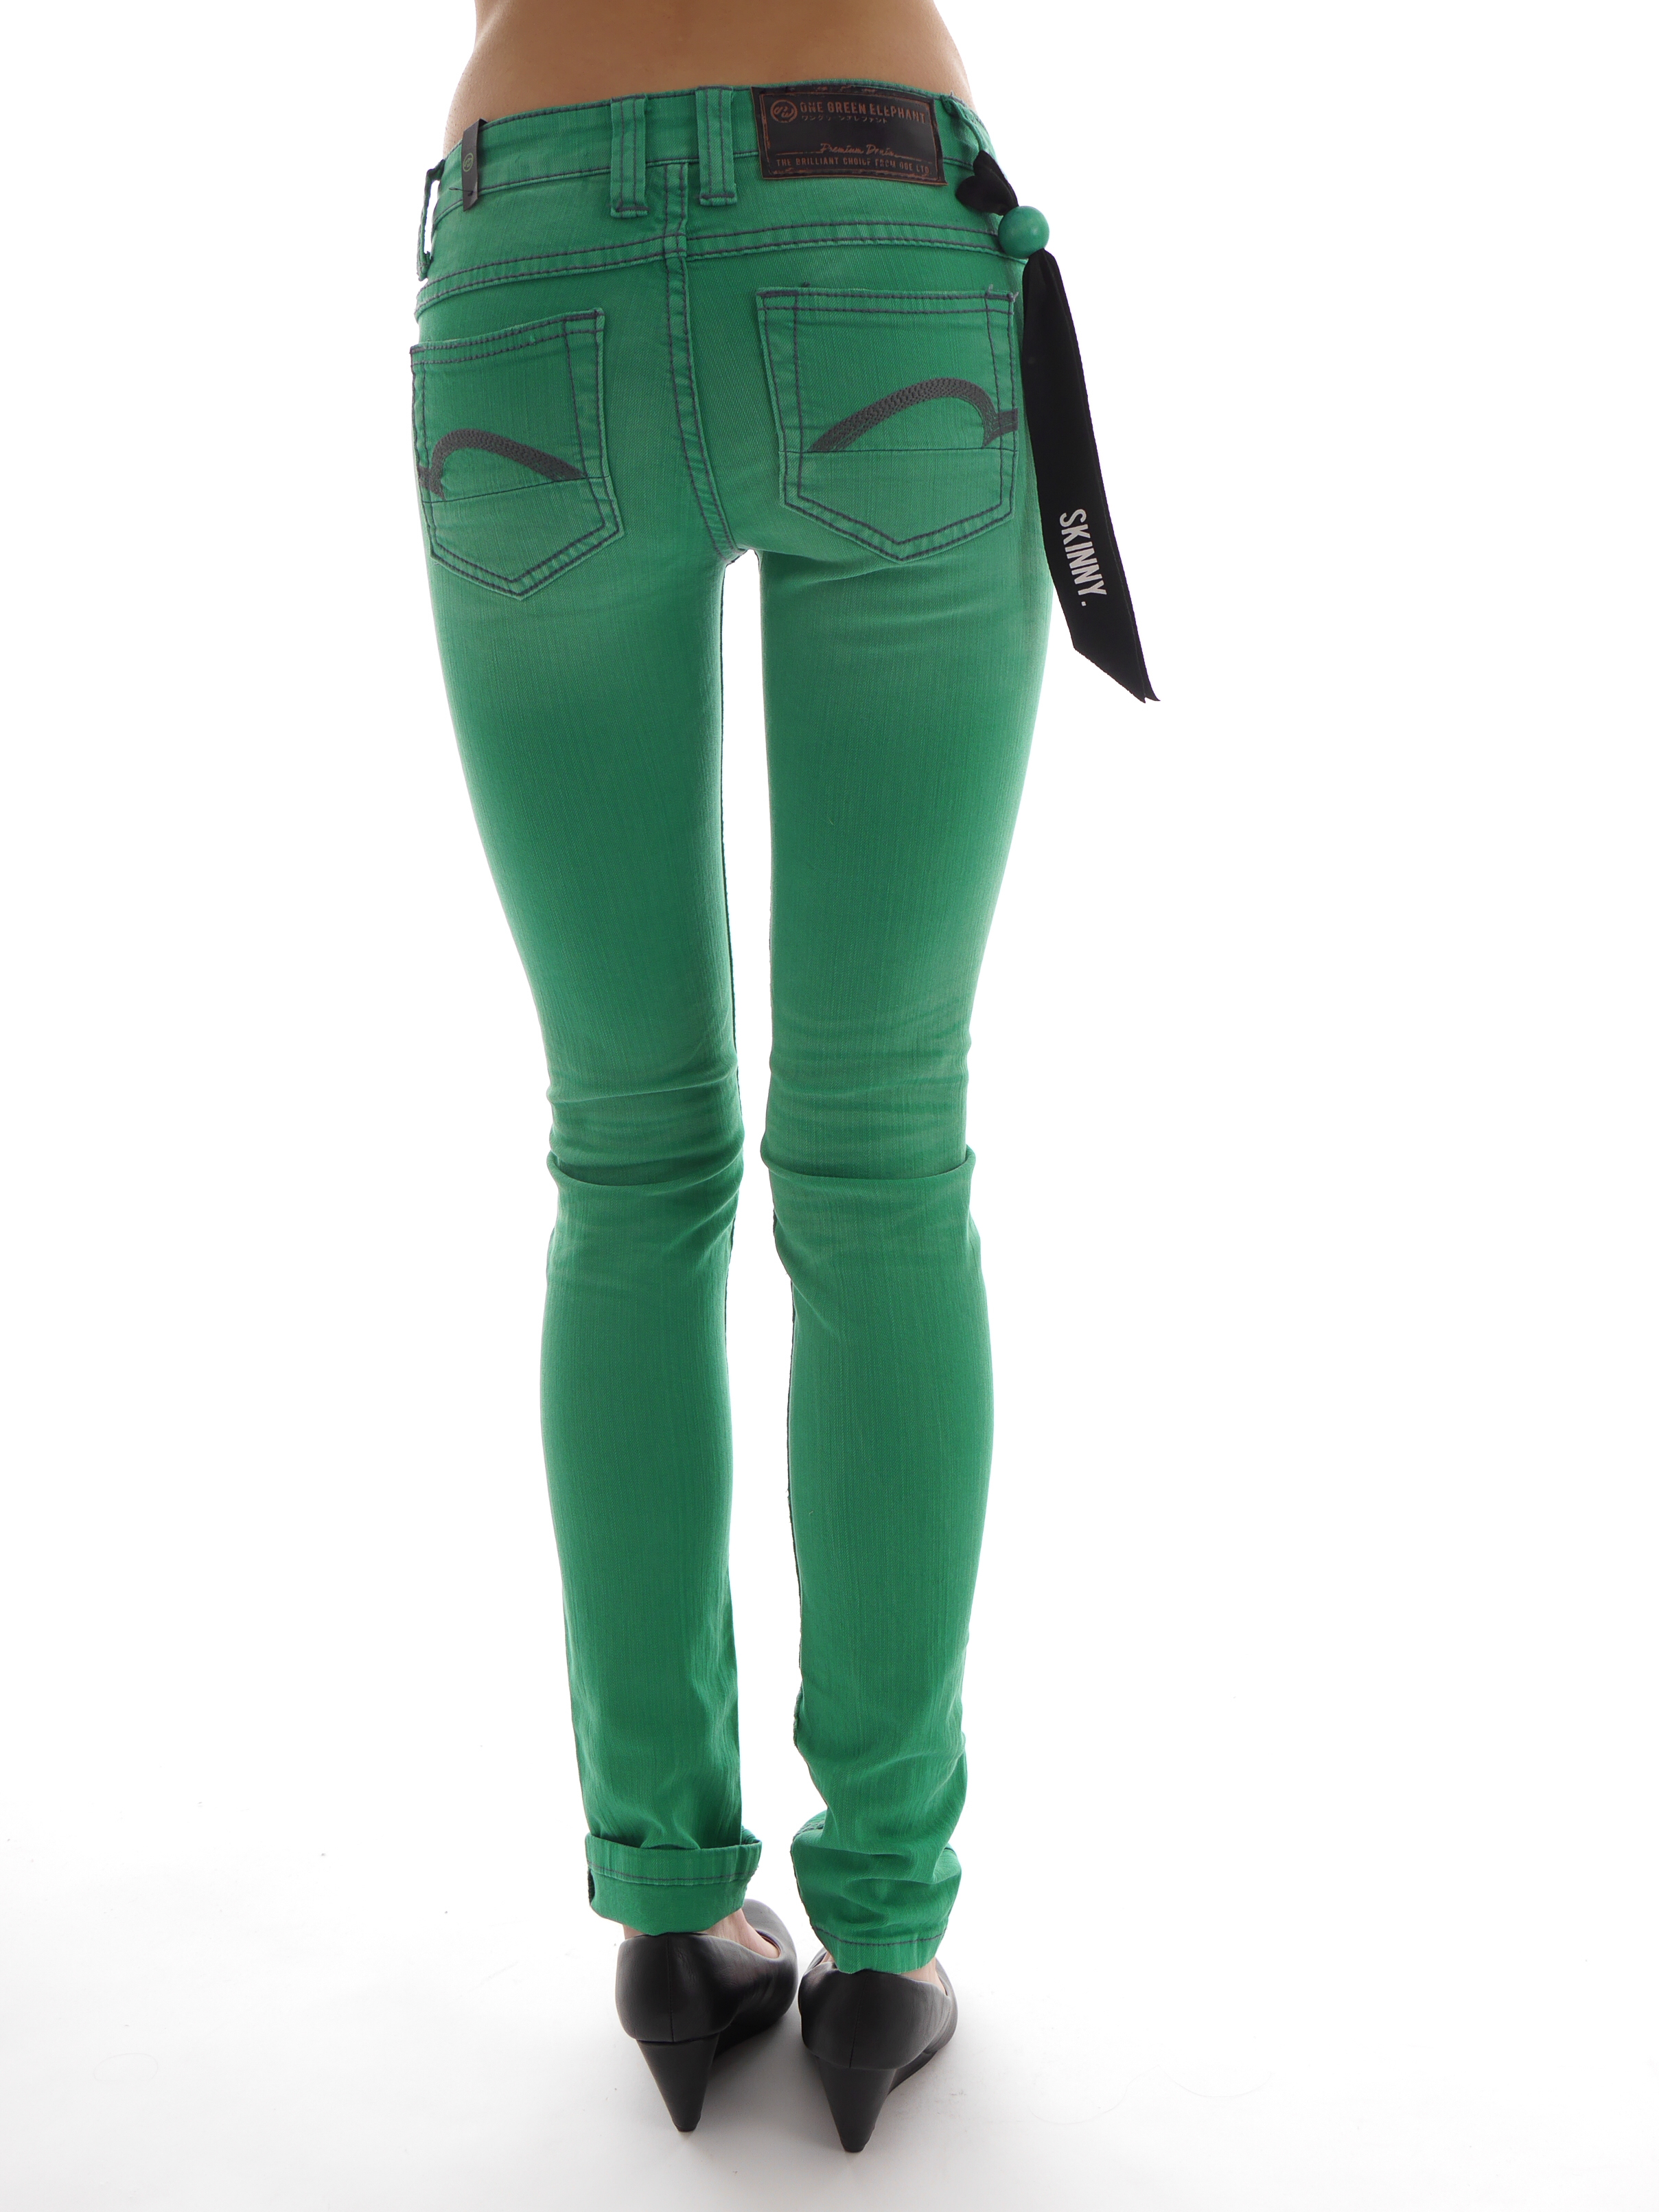 DENIM - Denim trousers One Green Elephant V3HFOZ